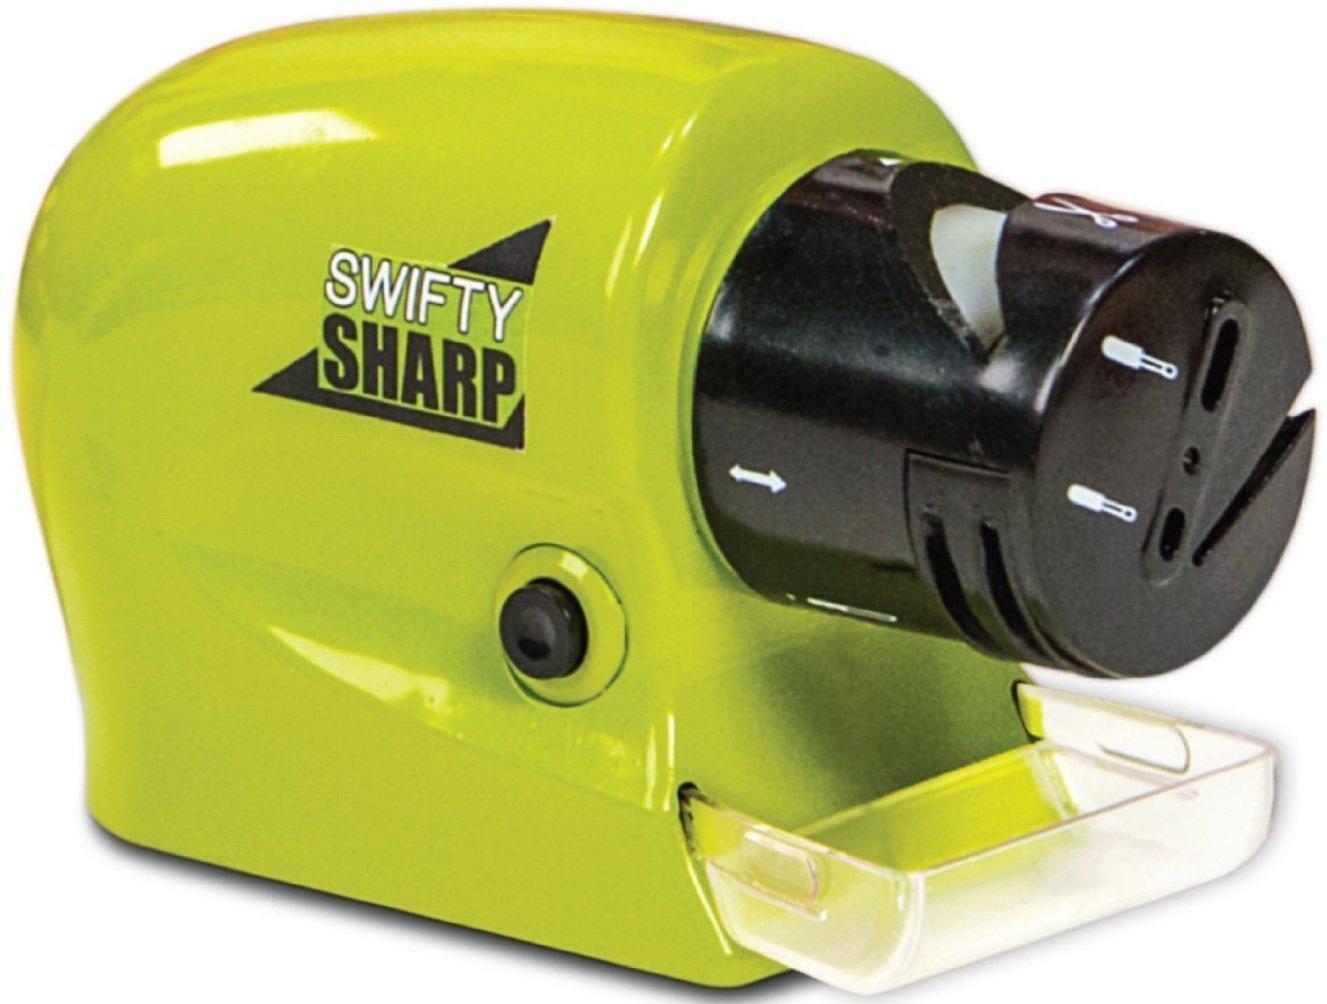 Amazon.com: Swifty Sharp Cordless, Motorized Knife Blade ...